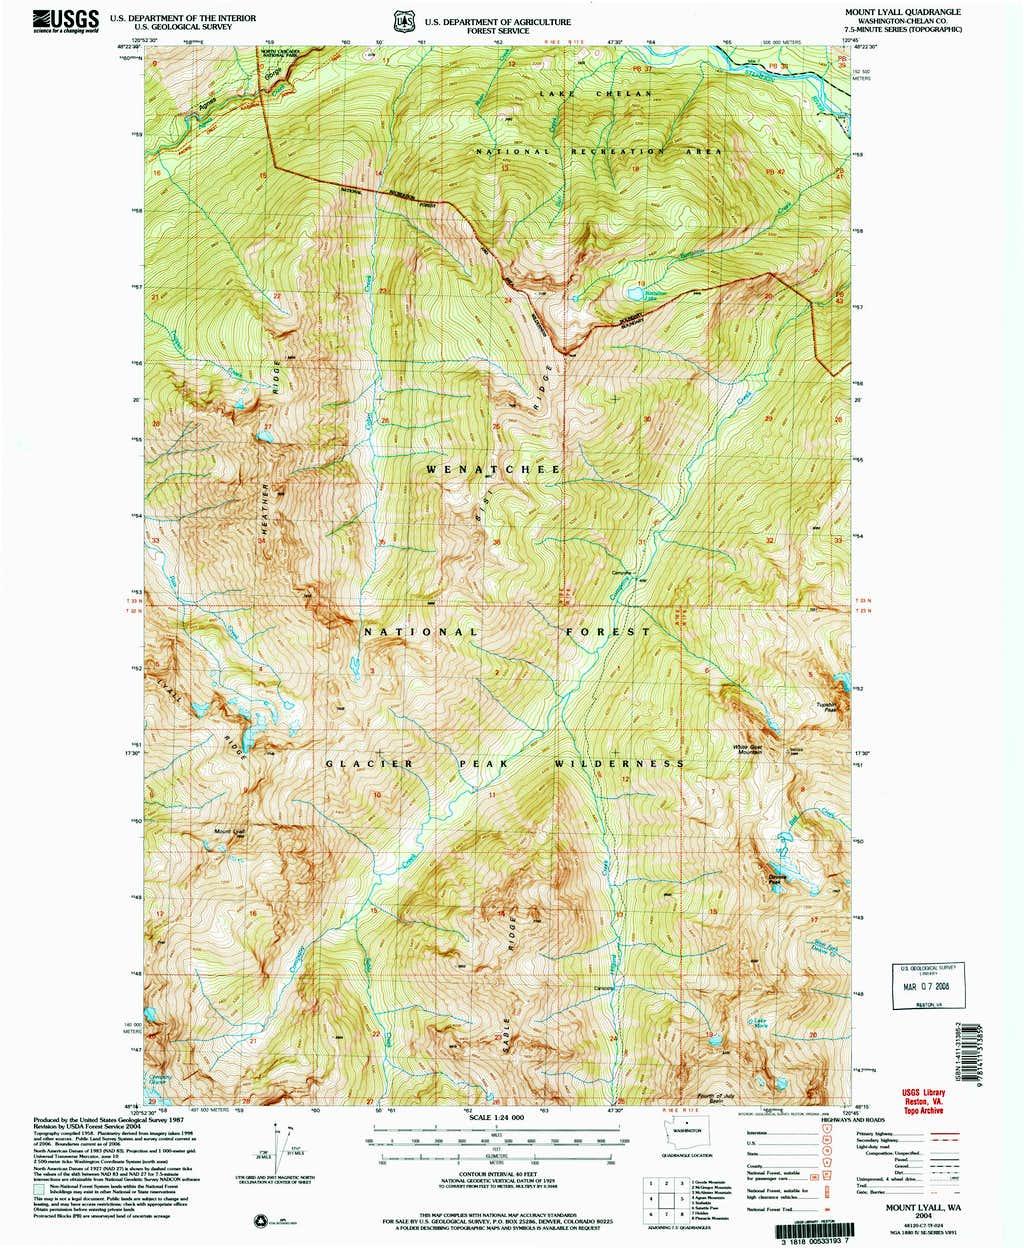 Mount Lyall Topo